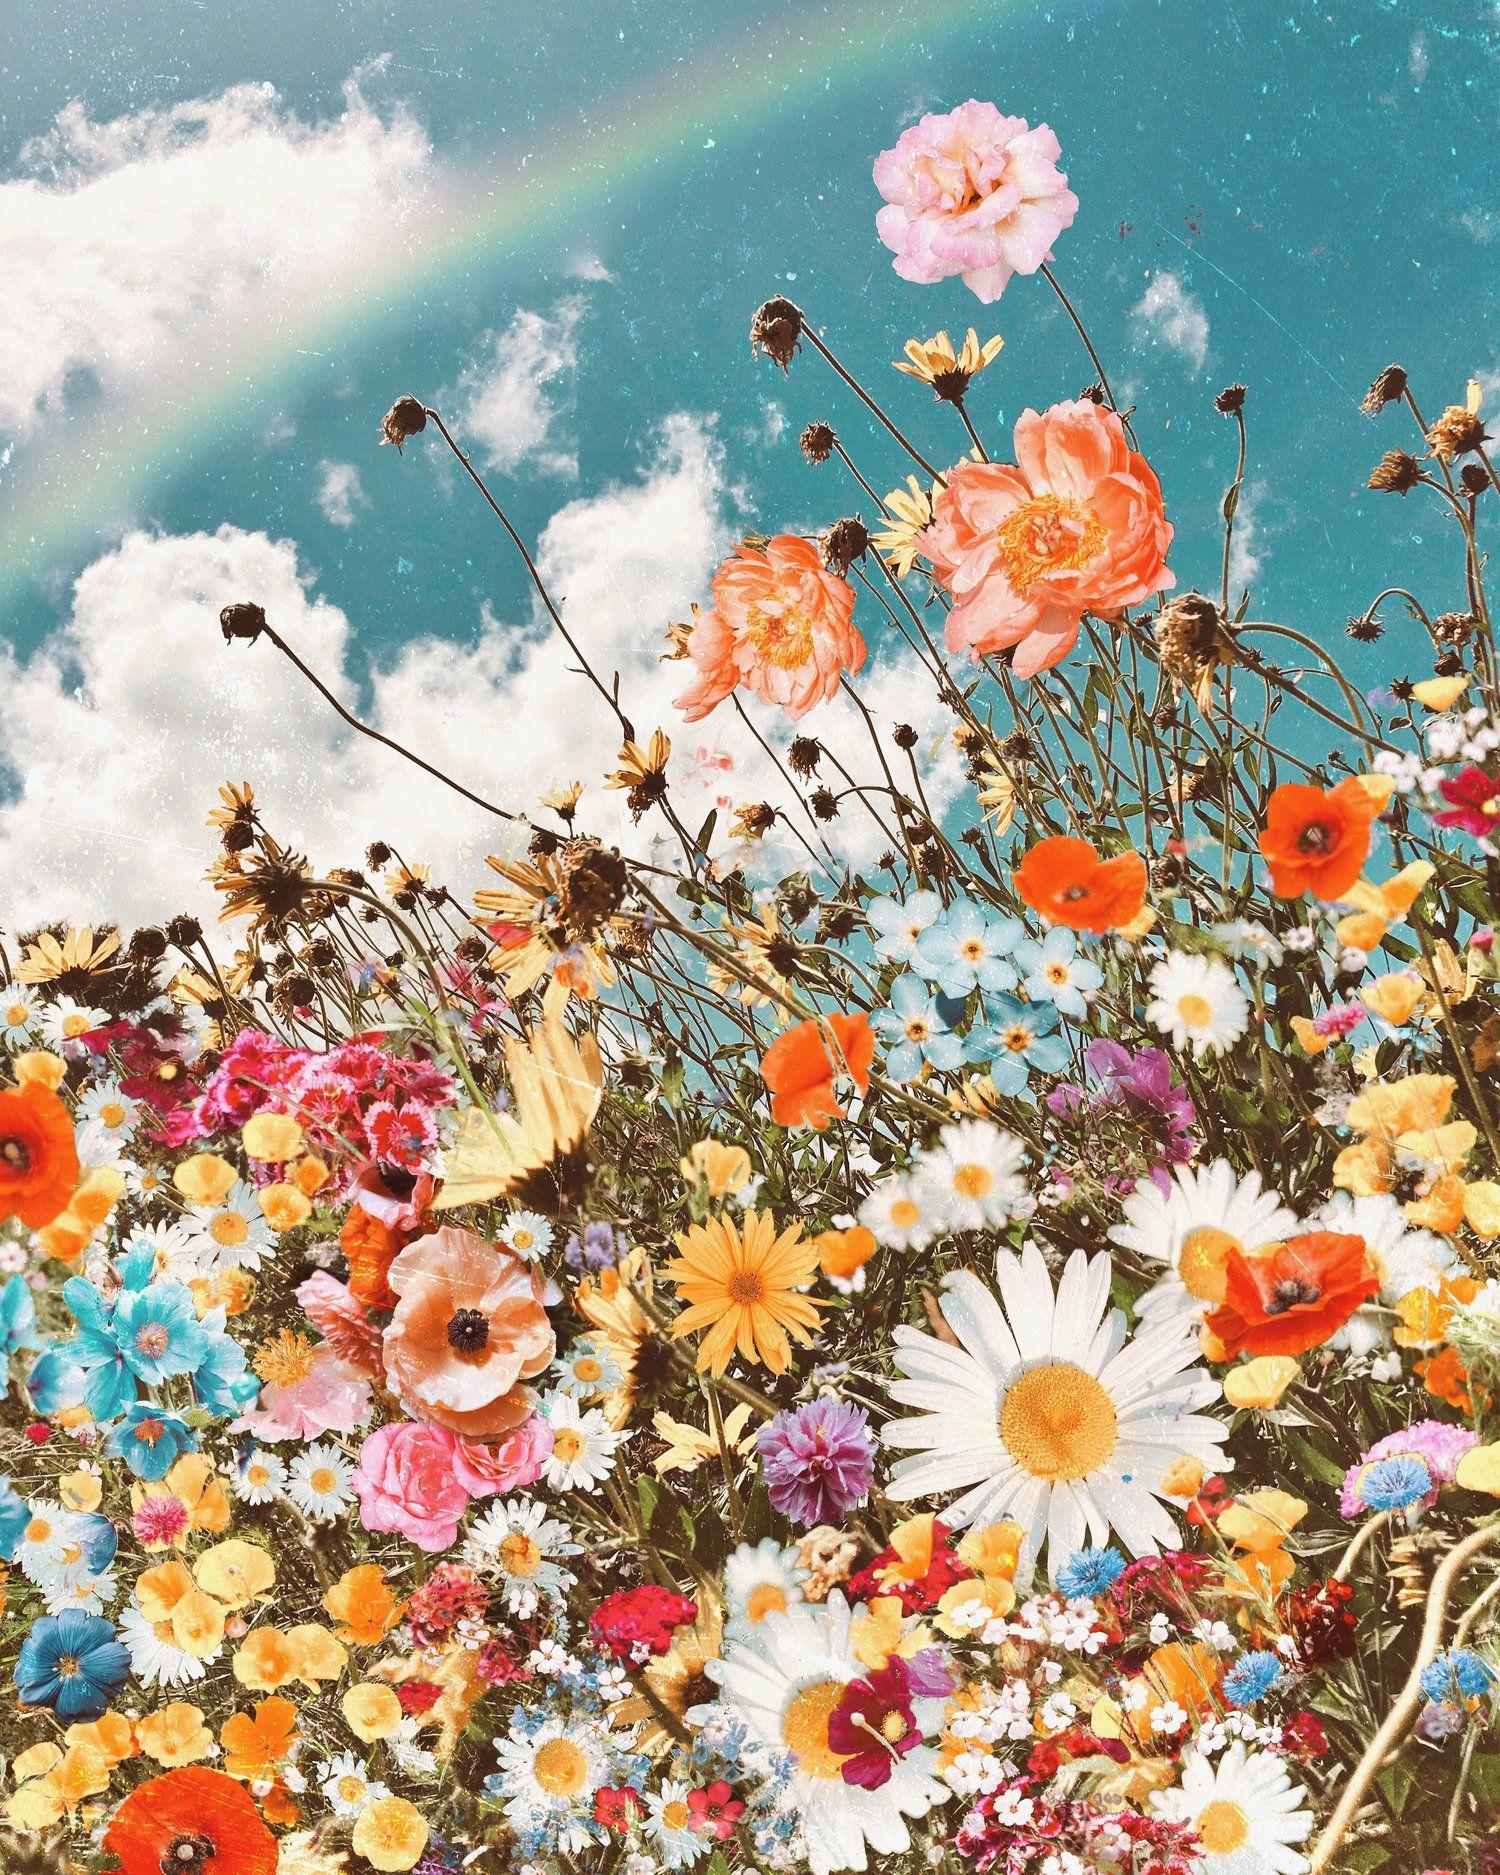 Oopsy Daisy Wallpaper nature flowers, Cute wallpaper